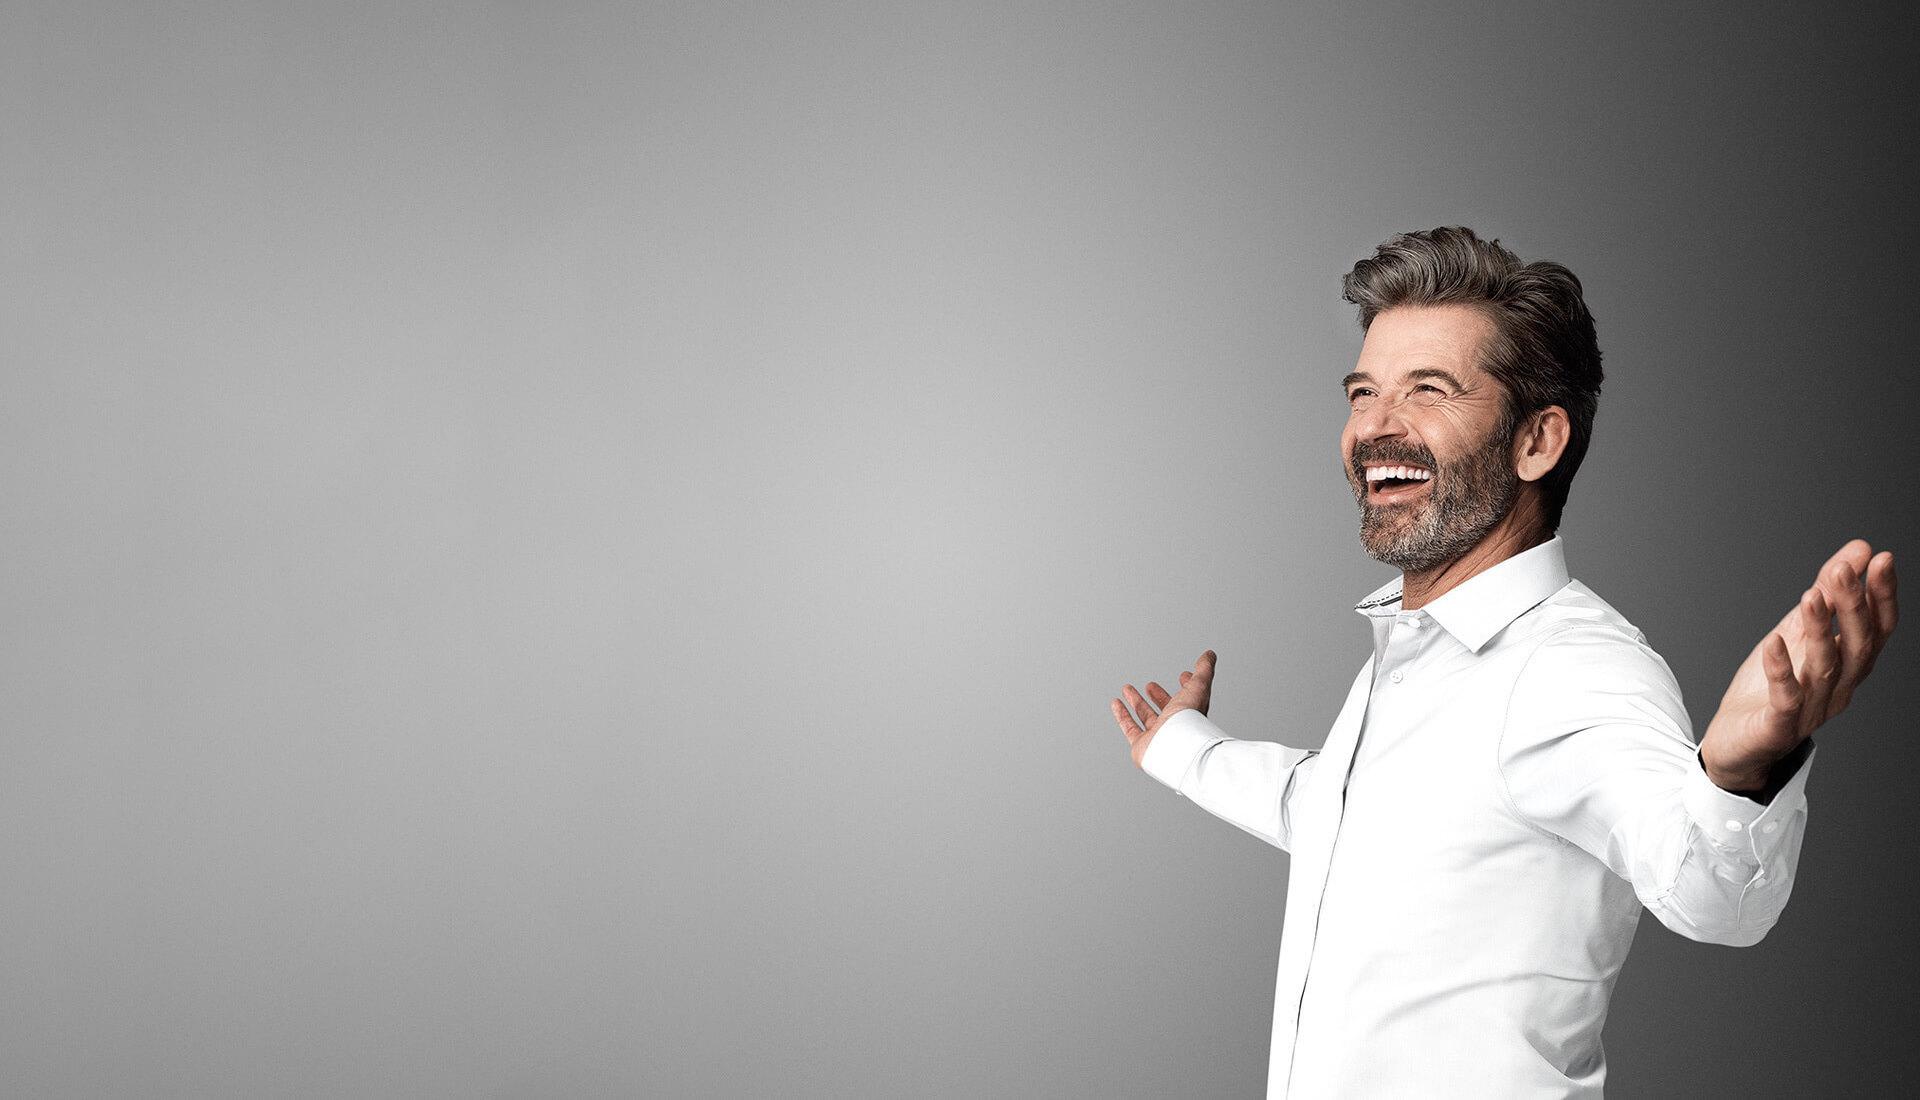 Gn Resound Price List >> GN Resound Hearing Aids - The Hearing Lab